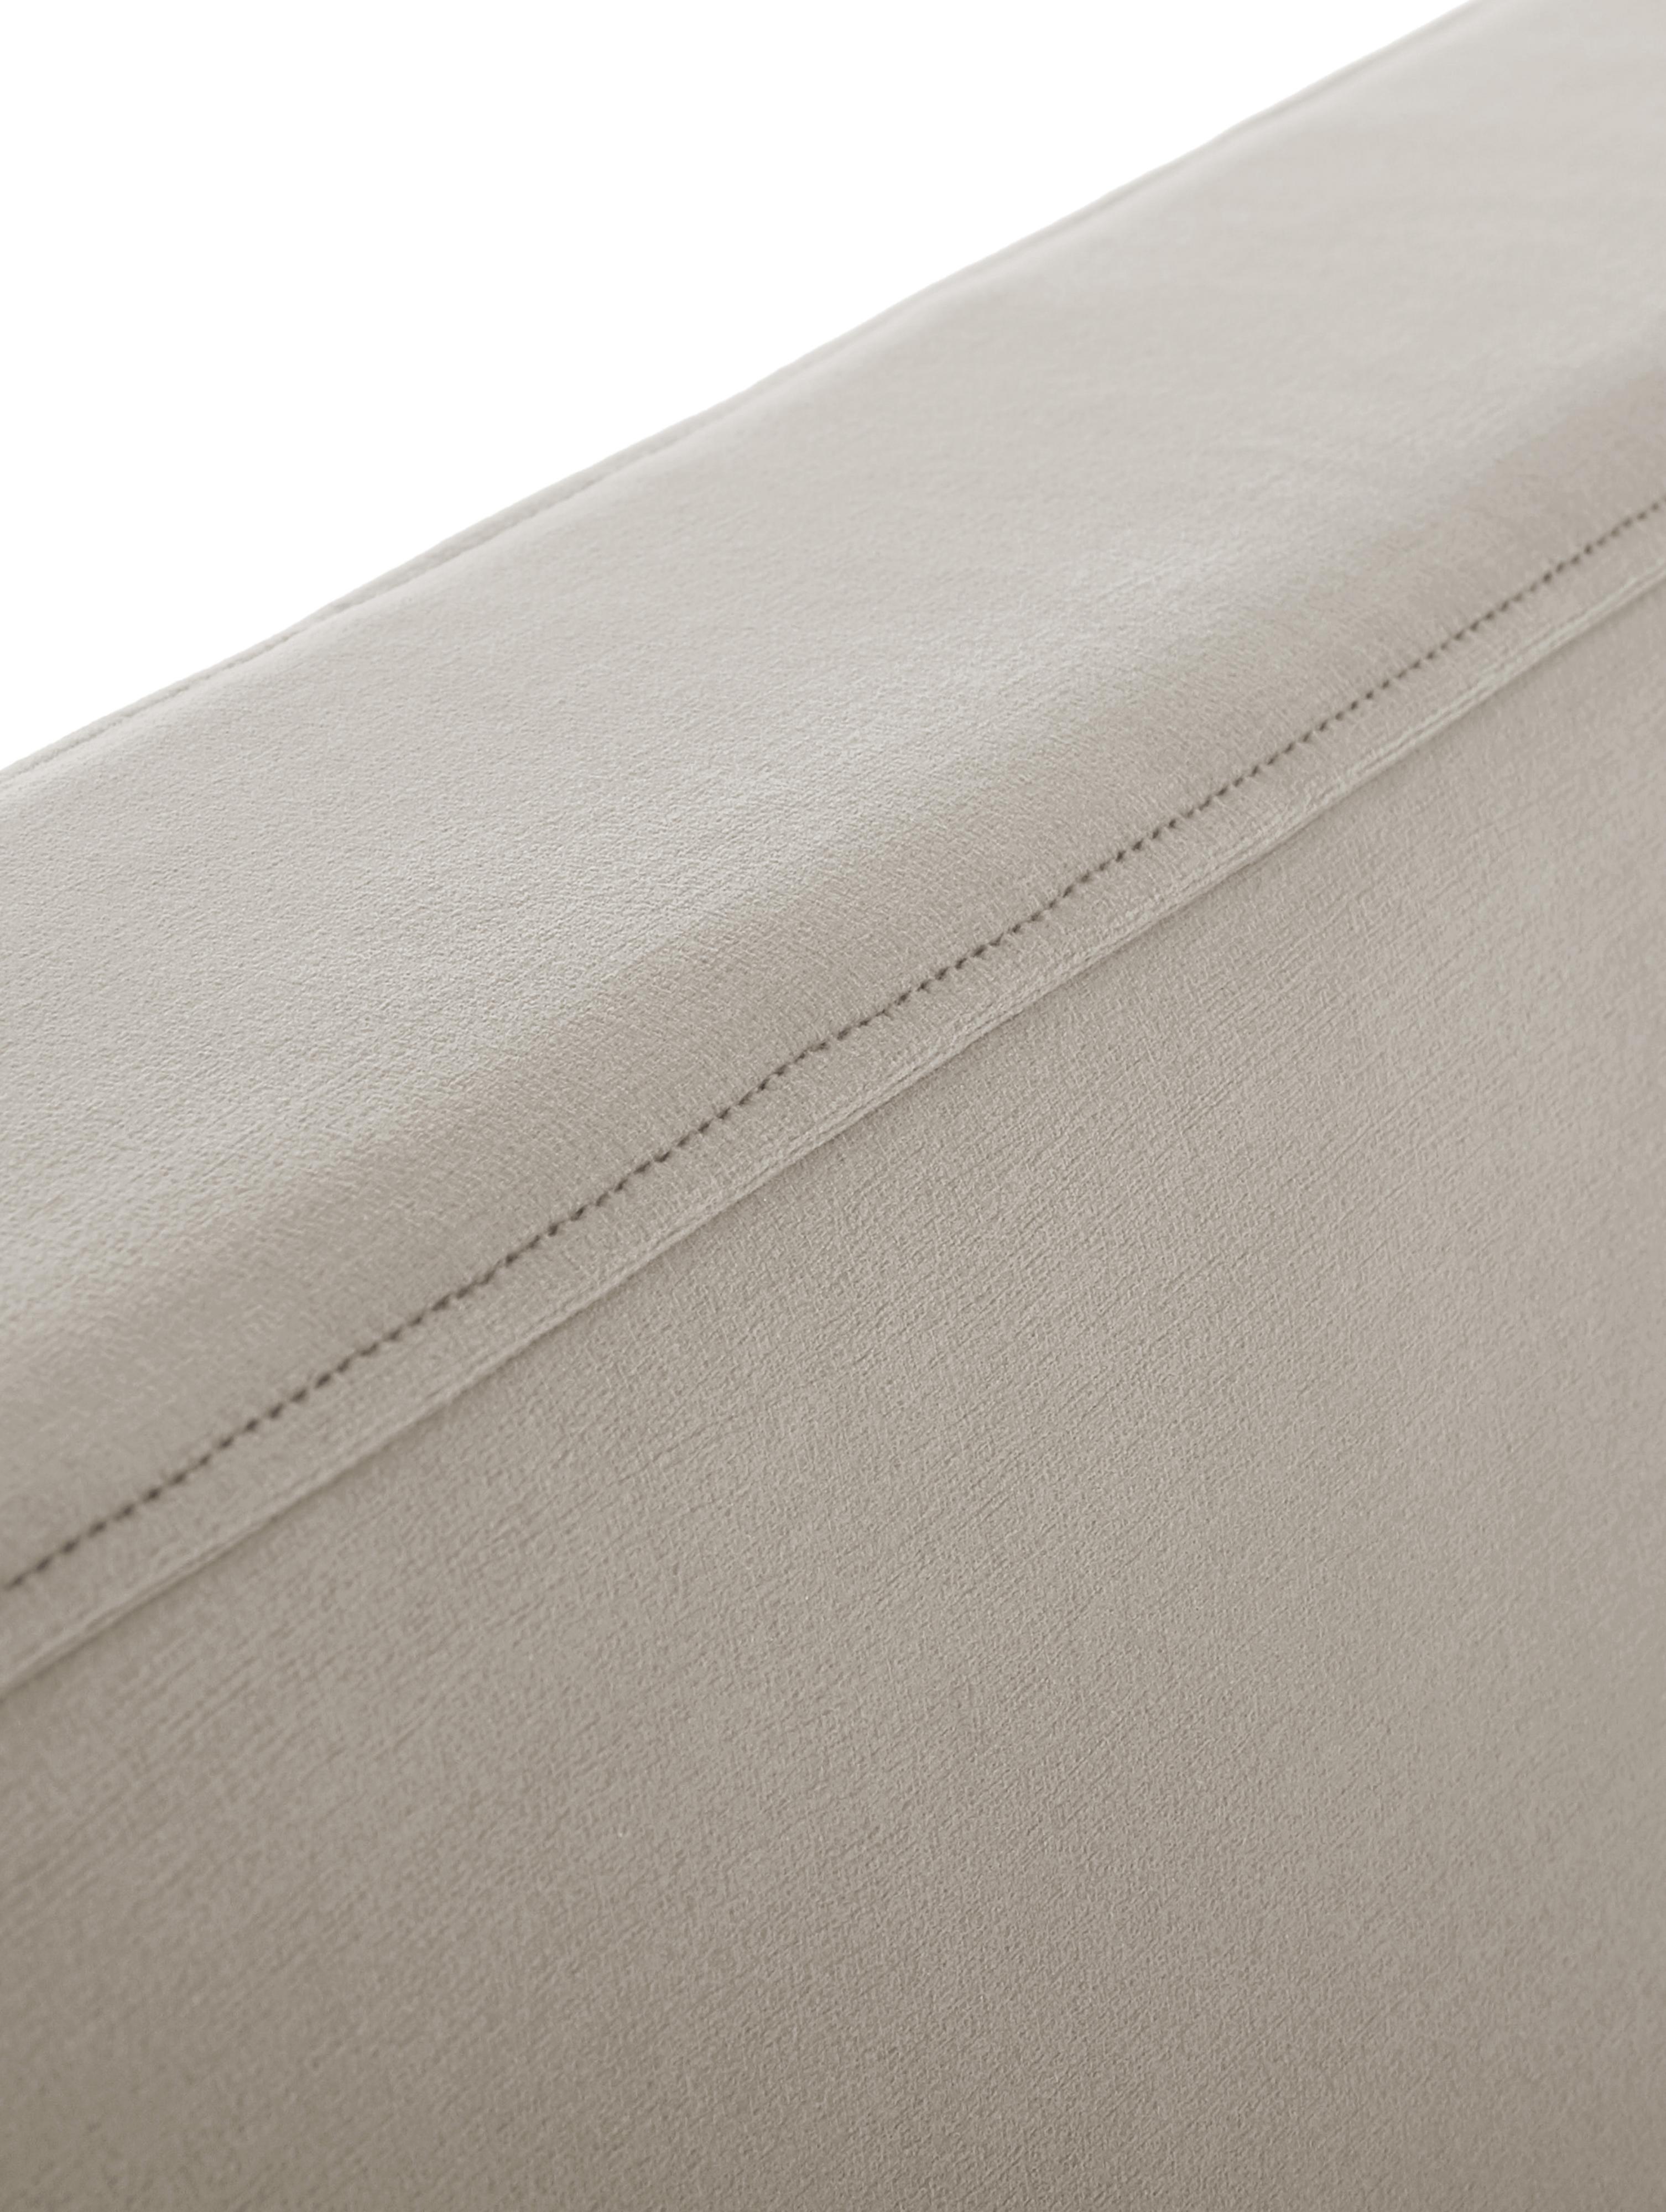 Cama de terciopelo Peace, Estructura: madera de pino macizo, Patas: metal, pintura en polvo, Funda: terciopelo de poliéster 3, Gris pardo, 160 x 200 cm